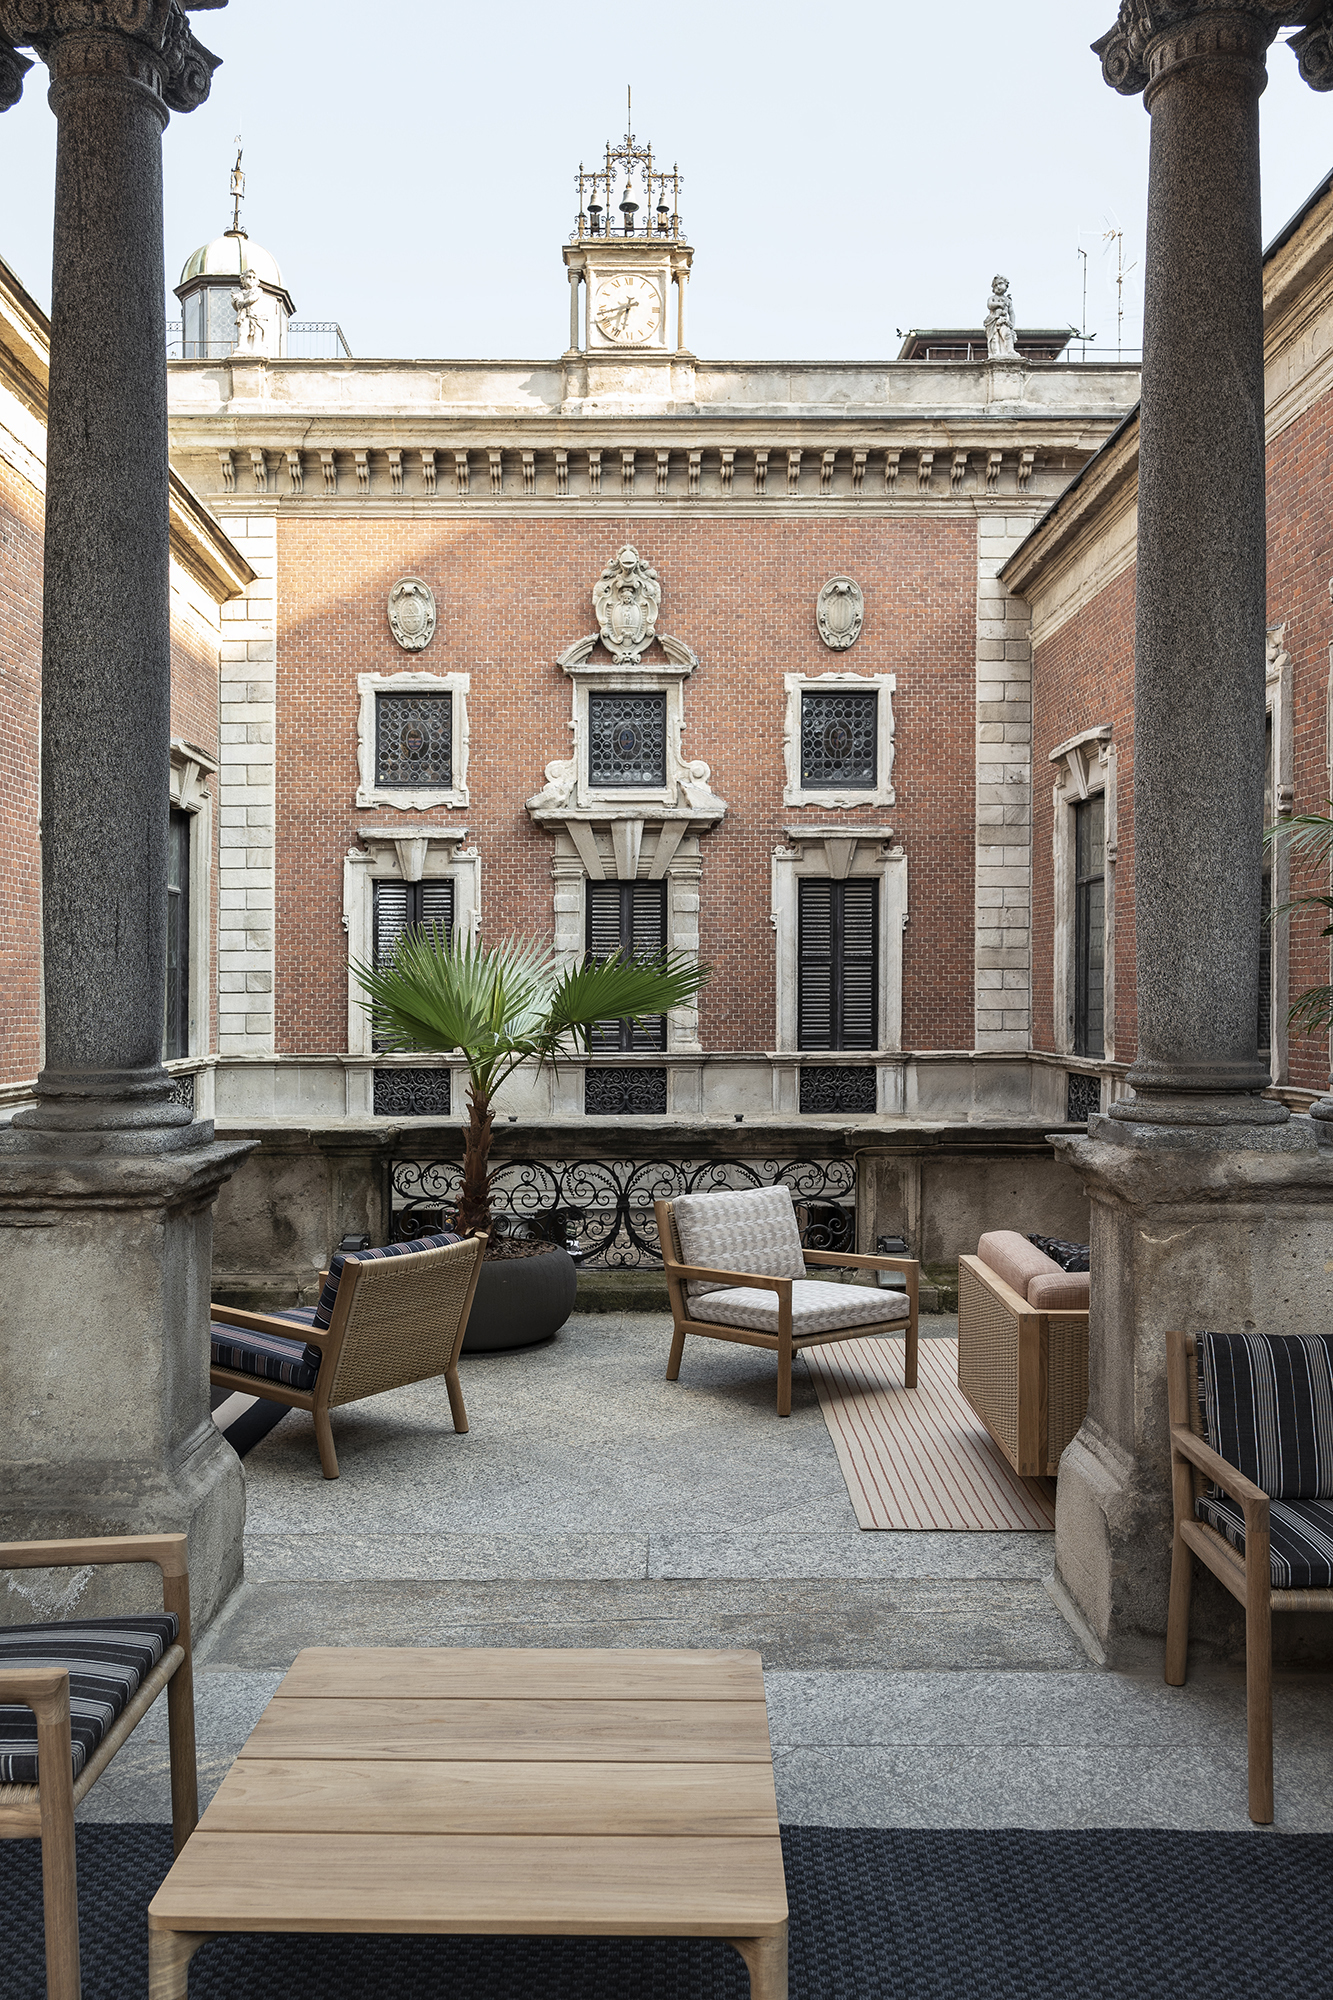 Vvda 2021 Sutherland Perennials Museum Bagatti Valsecchi Ph Marco Bertolini 01